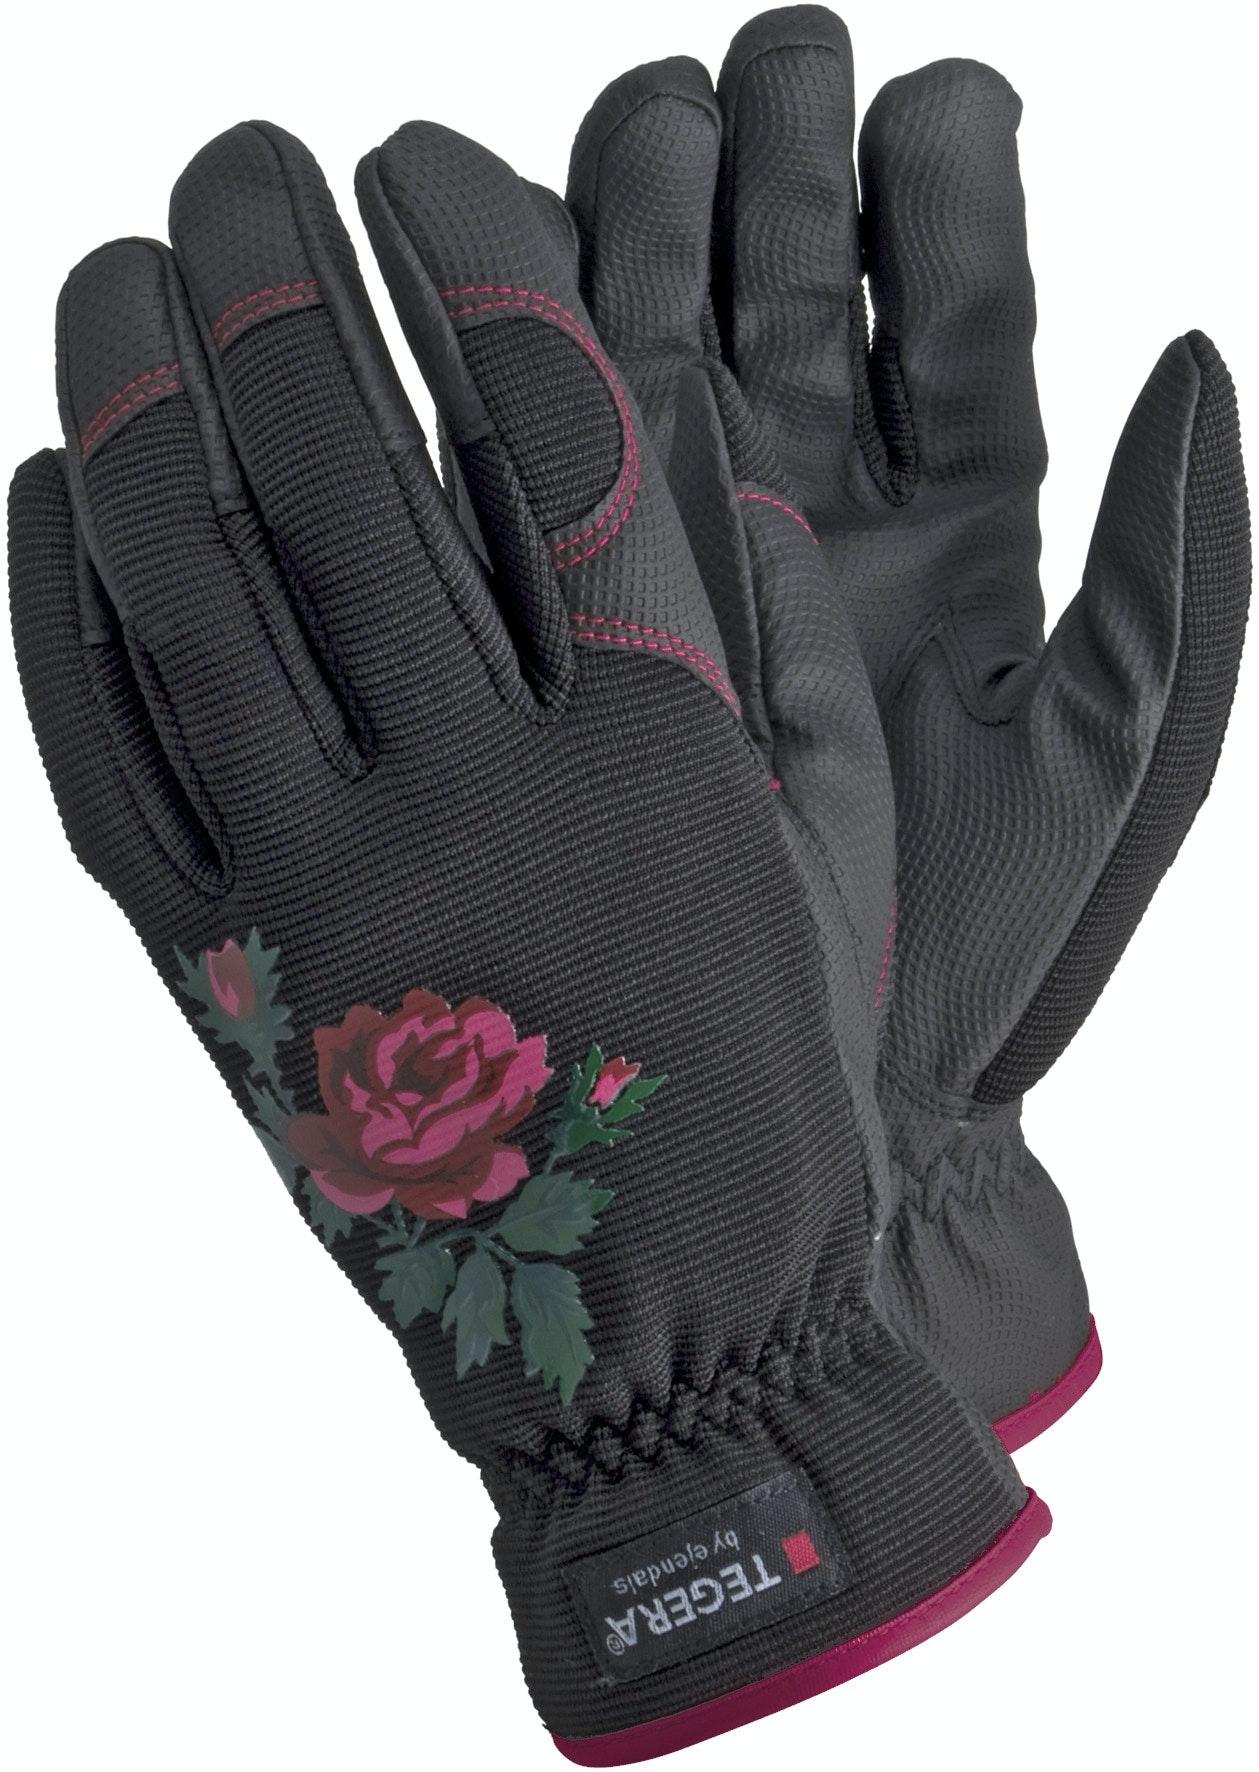 Handske Tegera 90030 Micro-Pu Stl 6